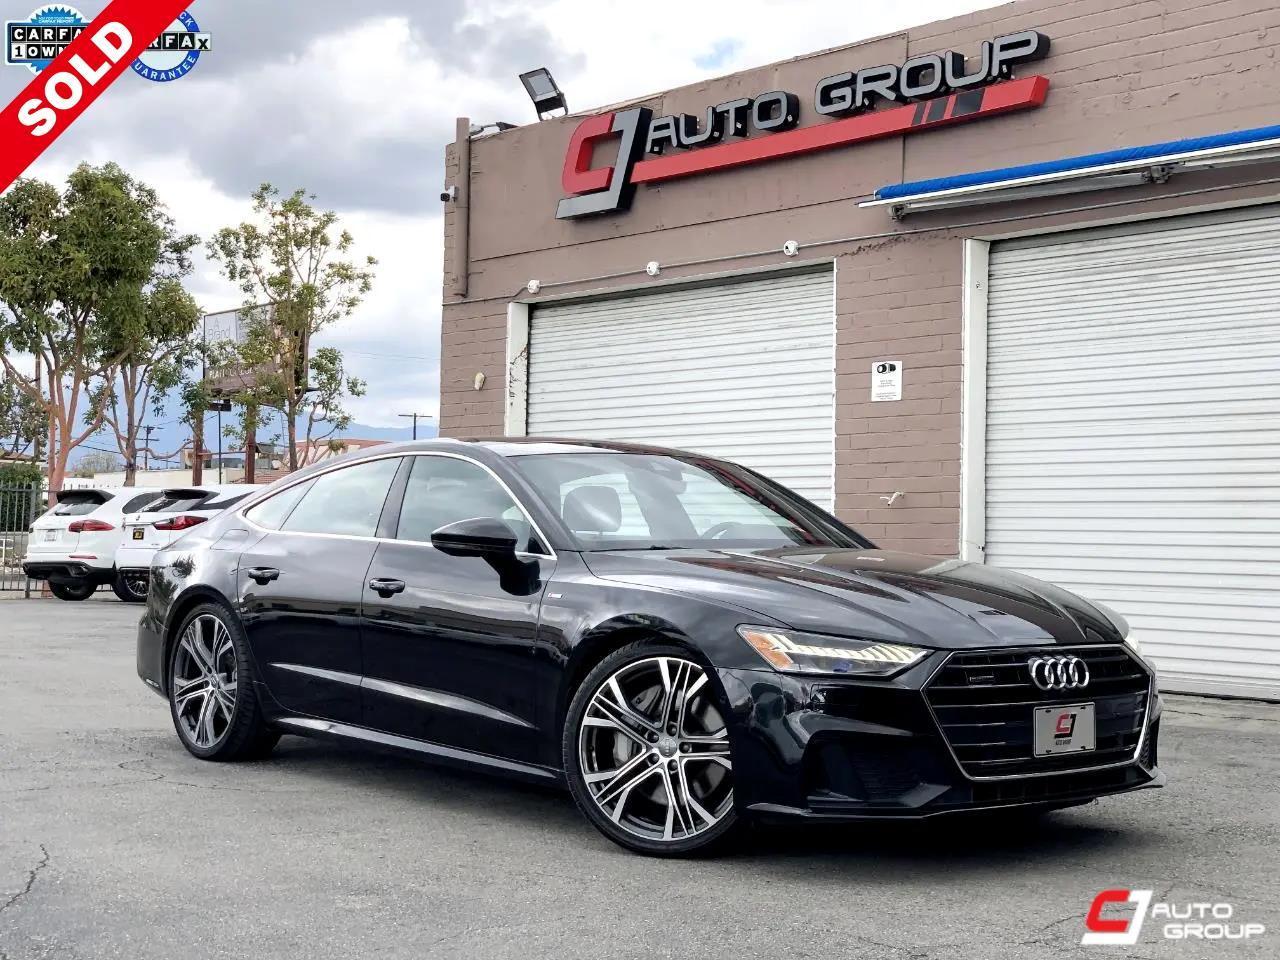 Audi A7 3.0 TFSI Prestige quattro 2019